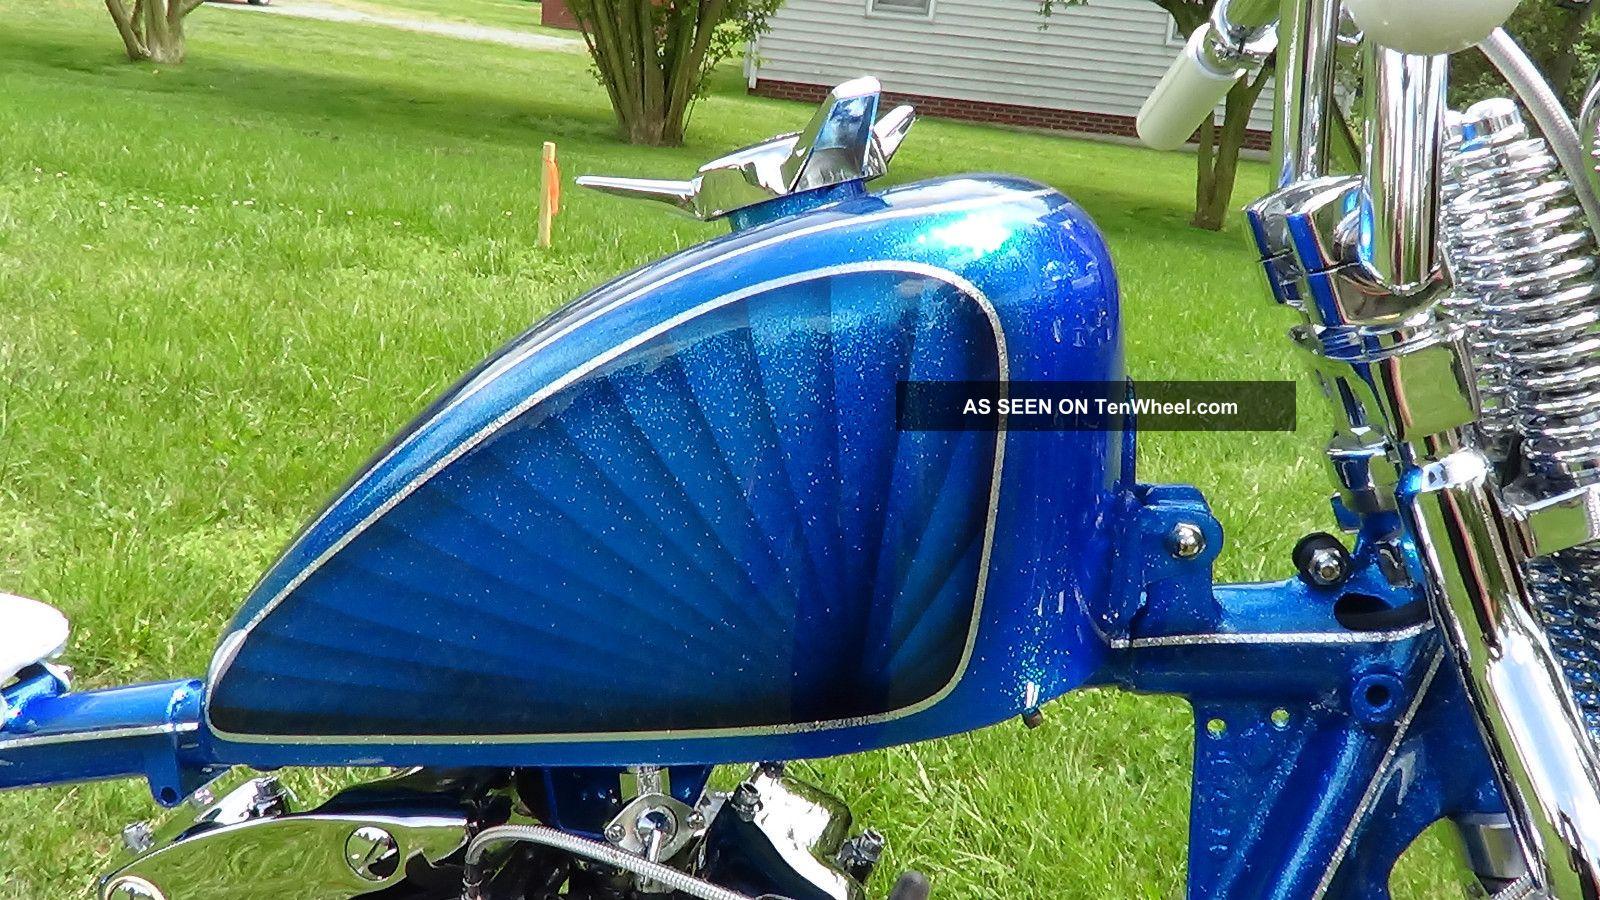 1973 Harley Davidson Ironhead Sportster Bobber Chopper Metalflake